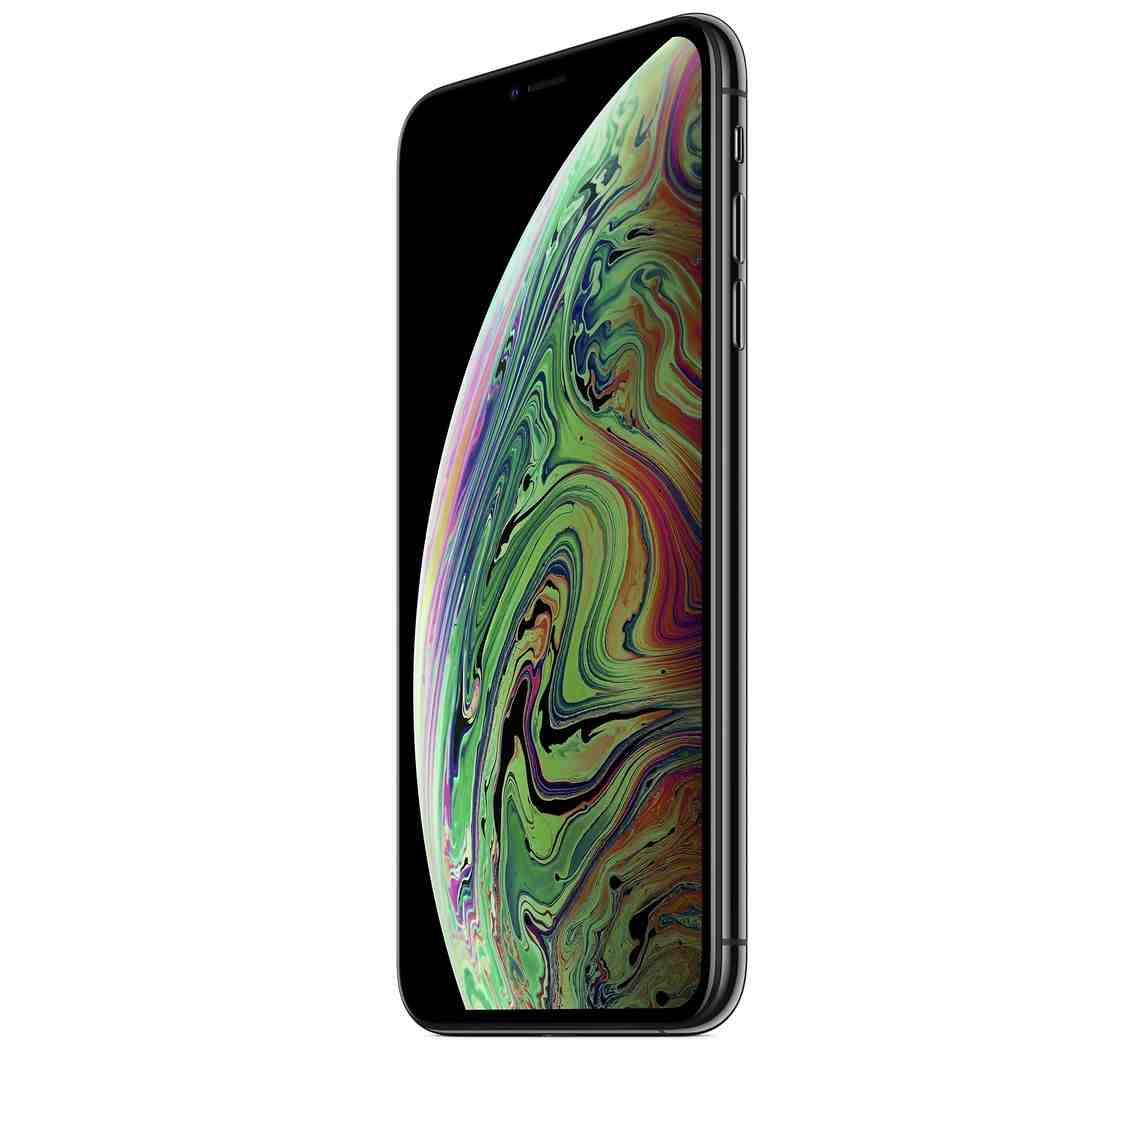 Iphone 12 pro max à vendre au Royaume-Uni